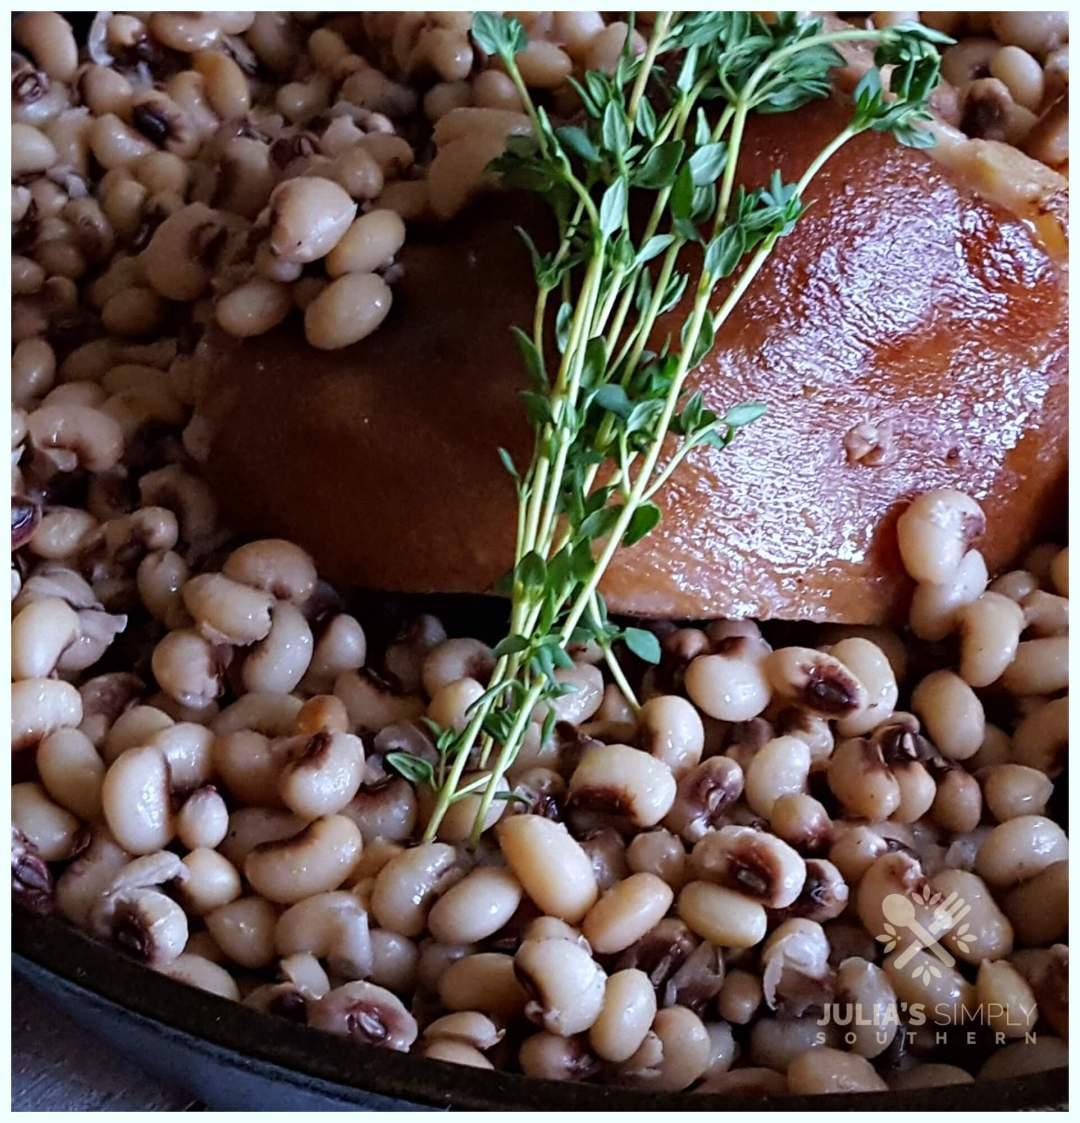 Ham Hock and peas